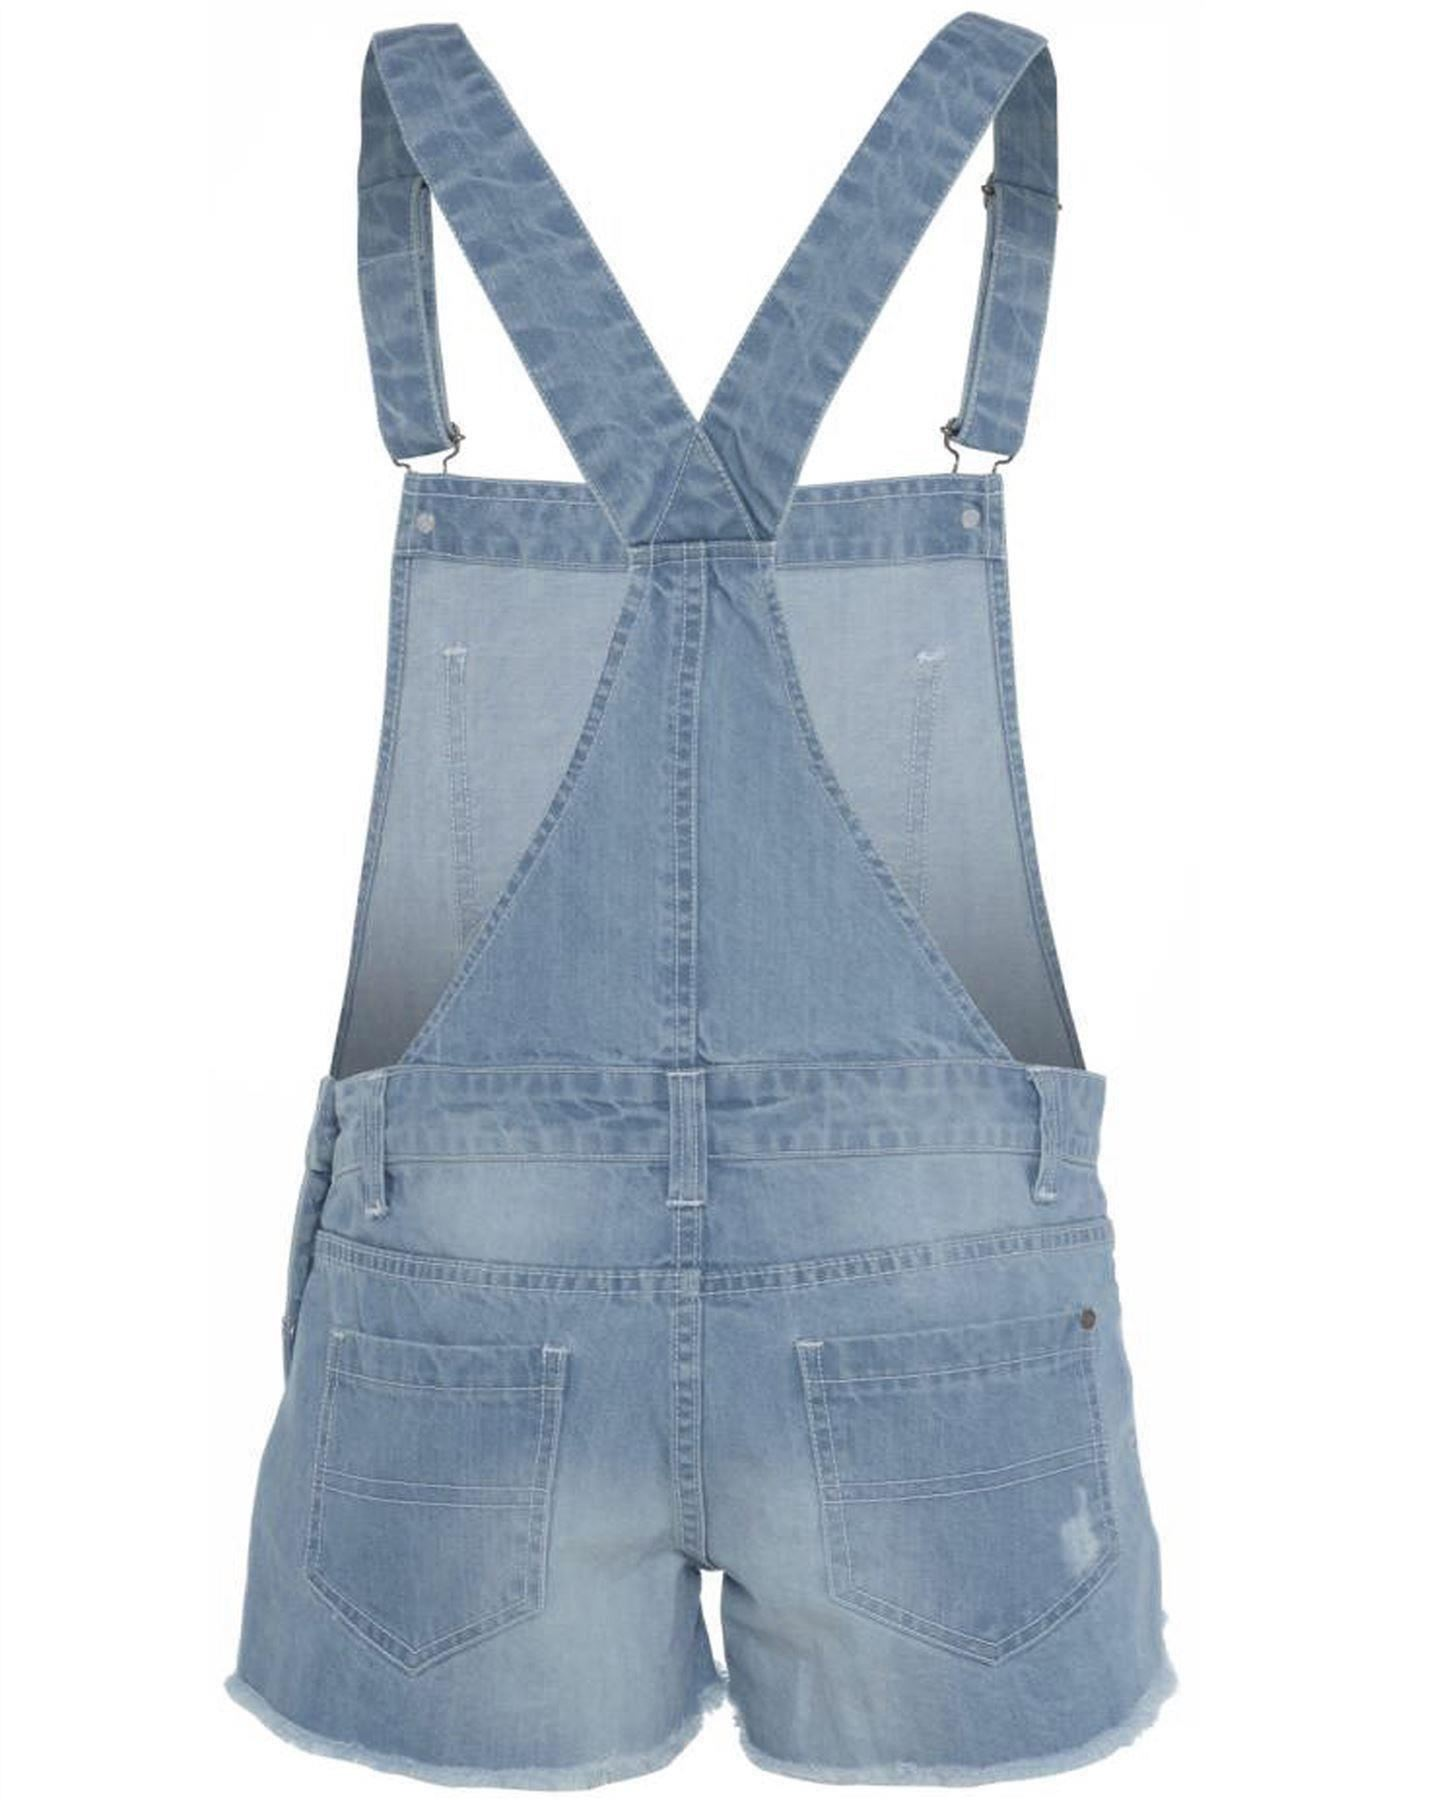 neue damen jeans helle waschung overall latzhose shorts ebay. Black Bedroom Furniture Sets. Home Design Ideas